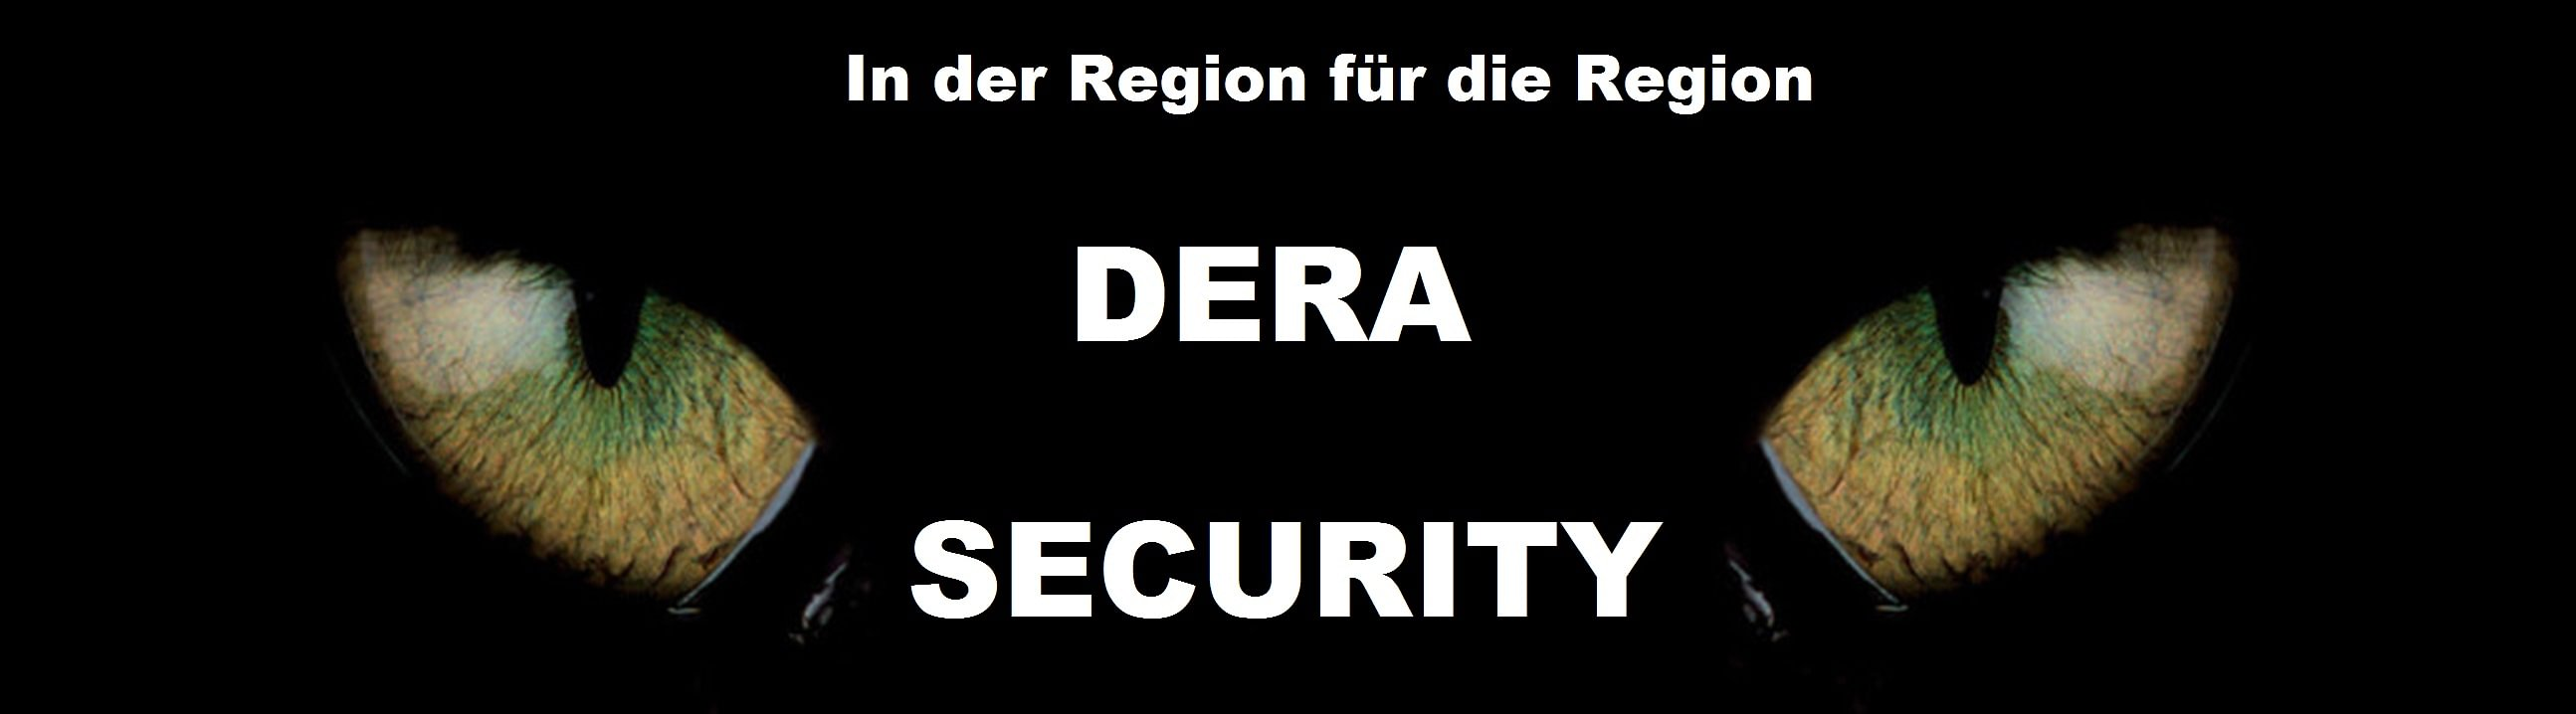 DERA Security - Degenati Radames